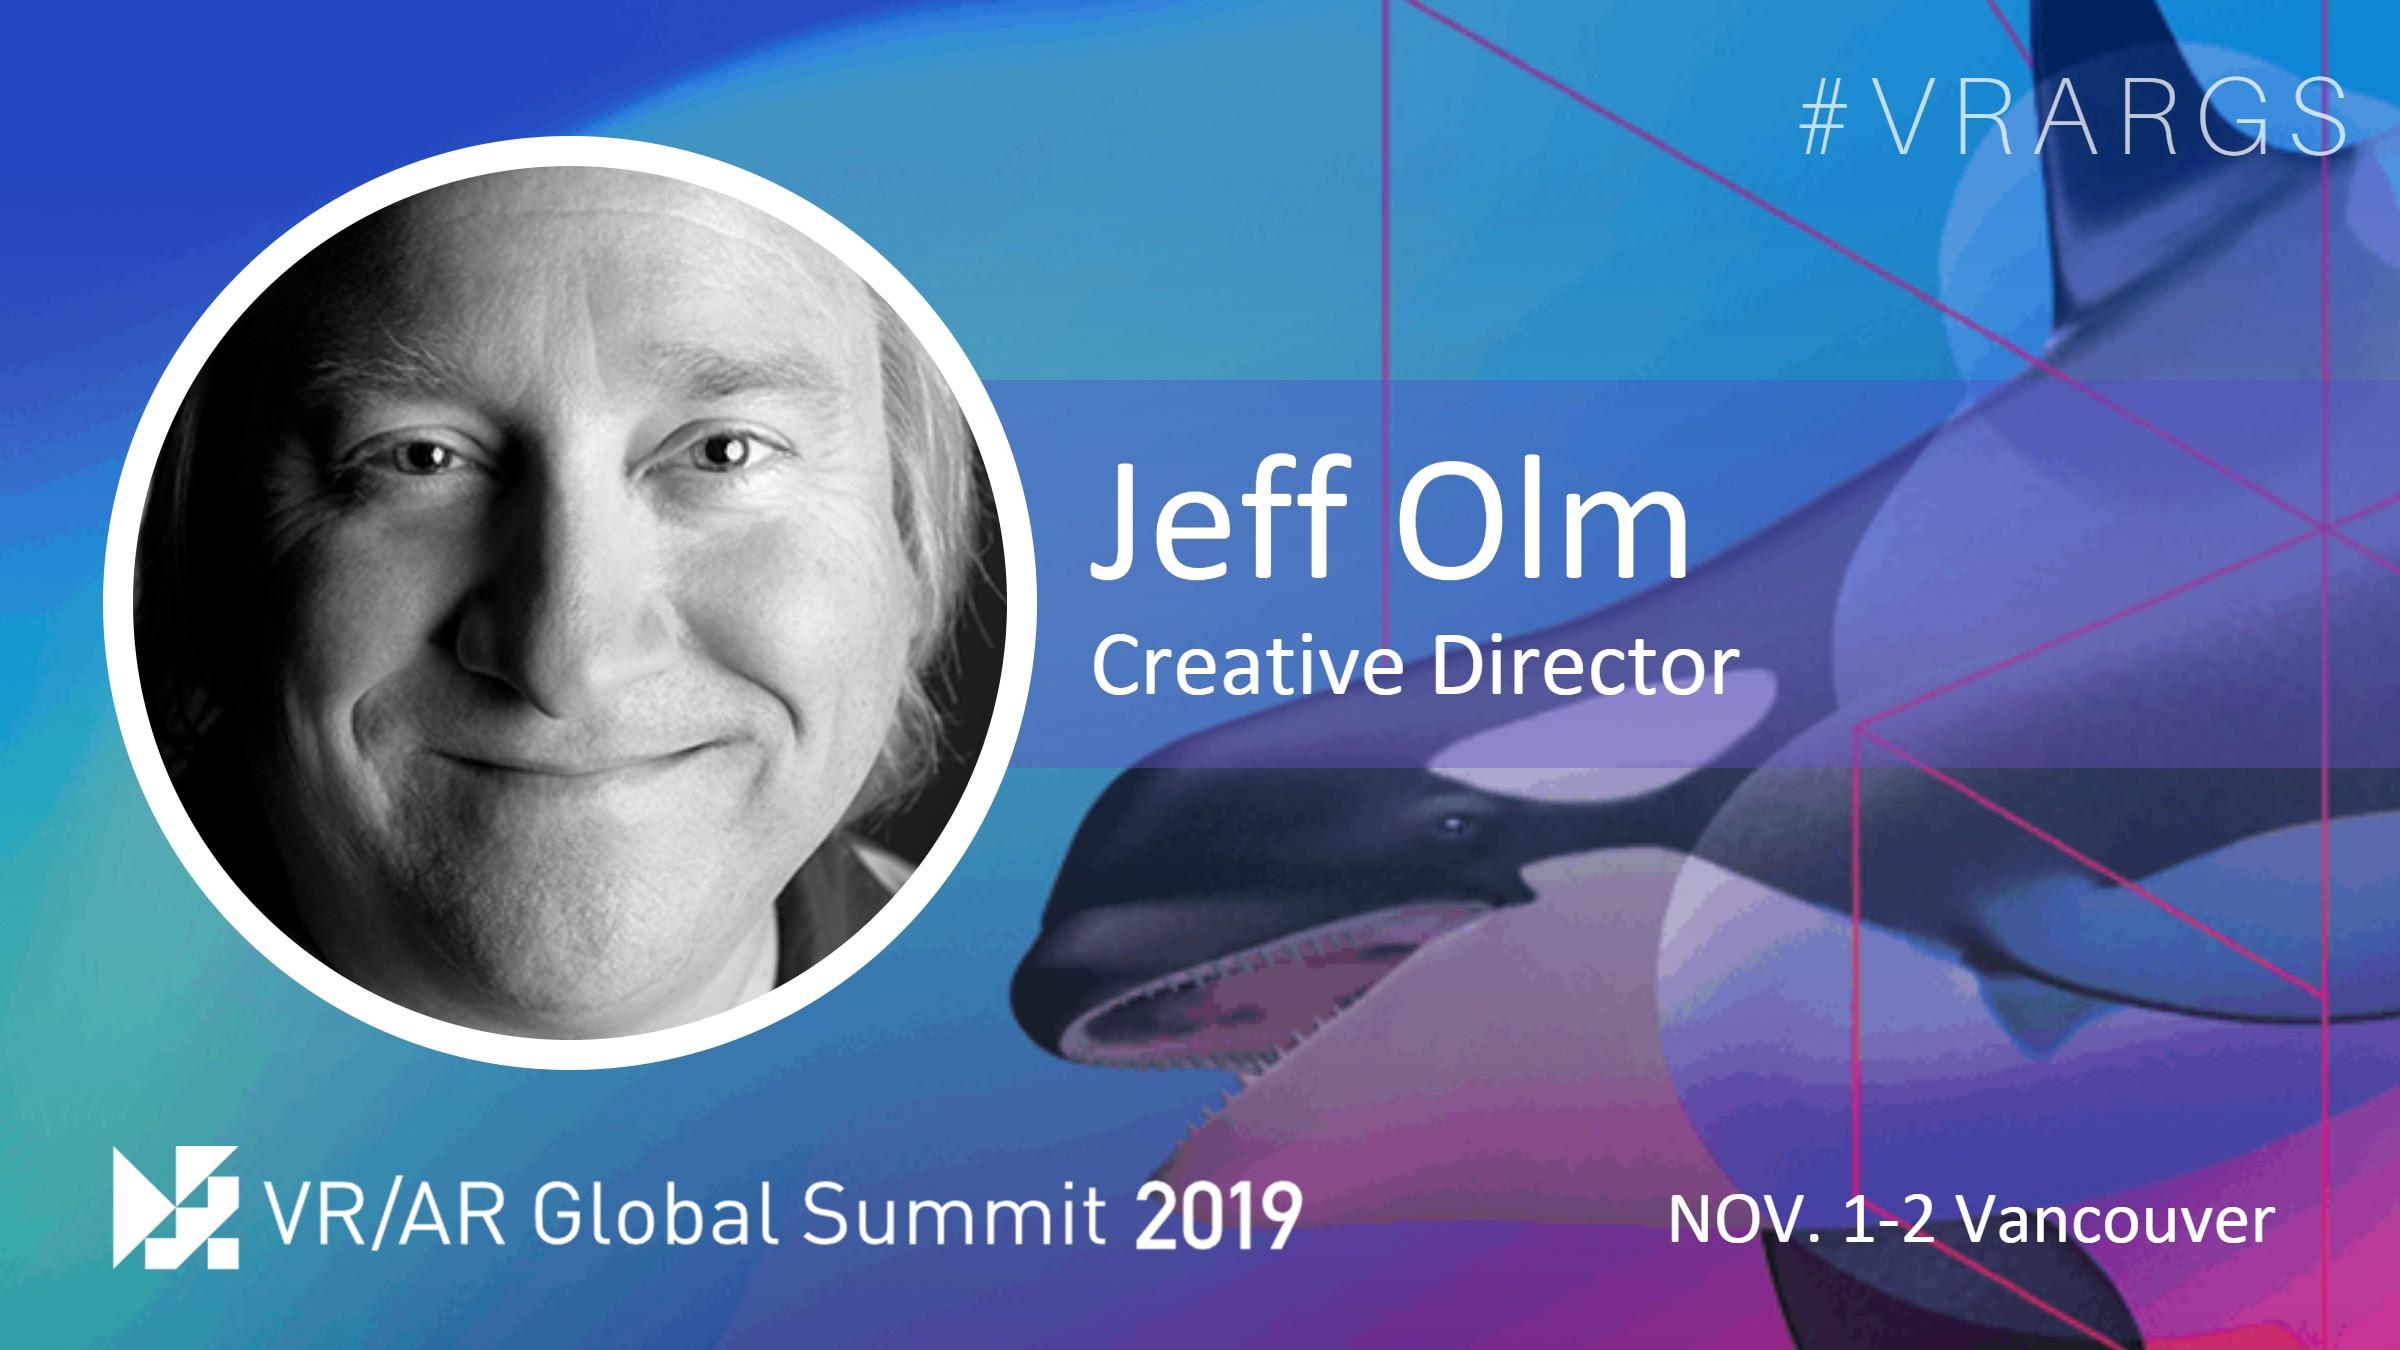 HighRes-Jeff-Olm-Creative-Director-VRARGS-VRAR-Global-Summit-Spatial-Computing-Vancouver.jpg